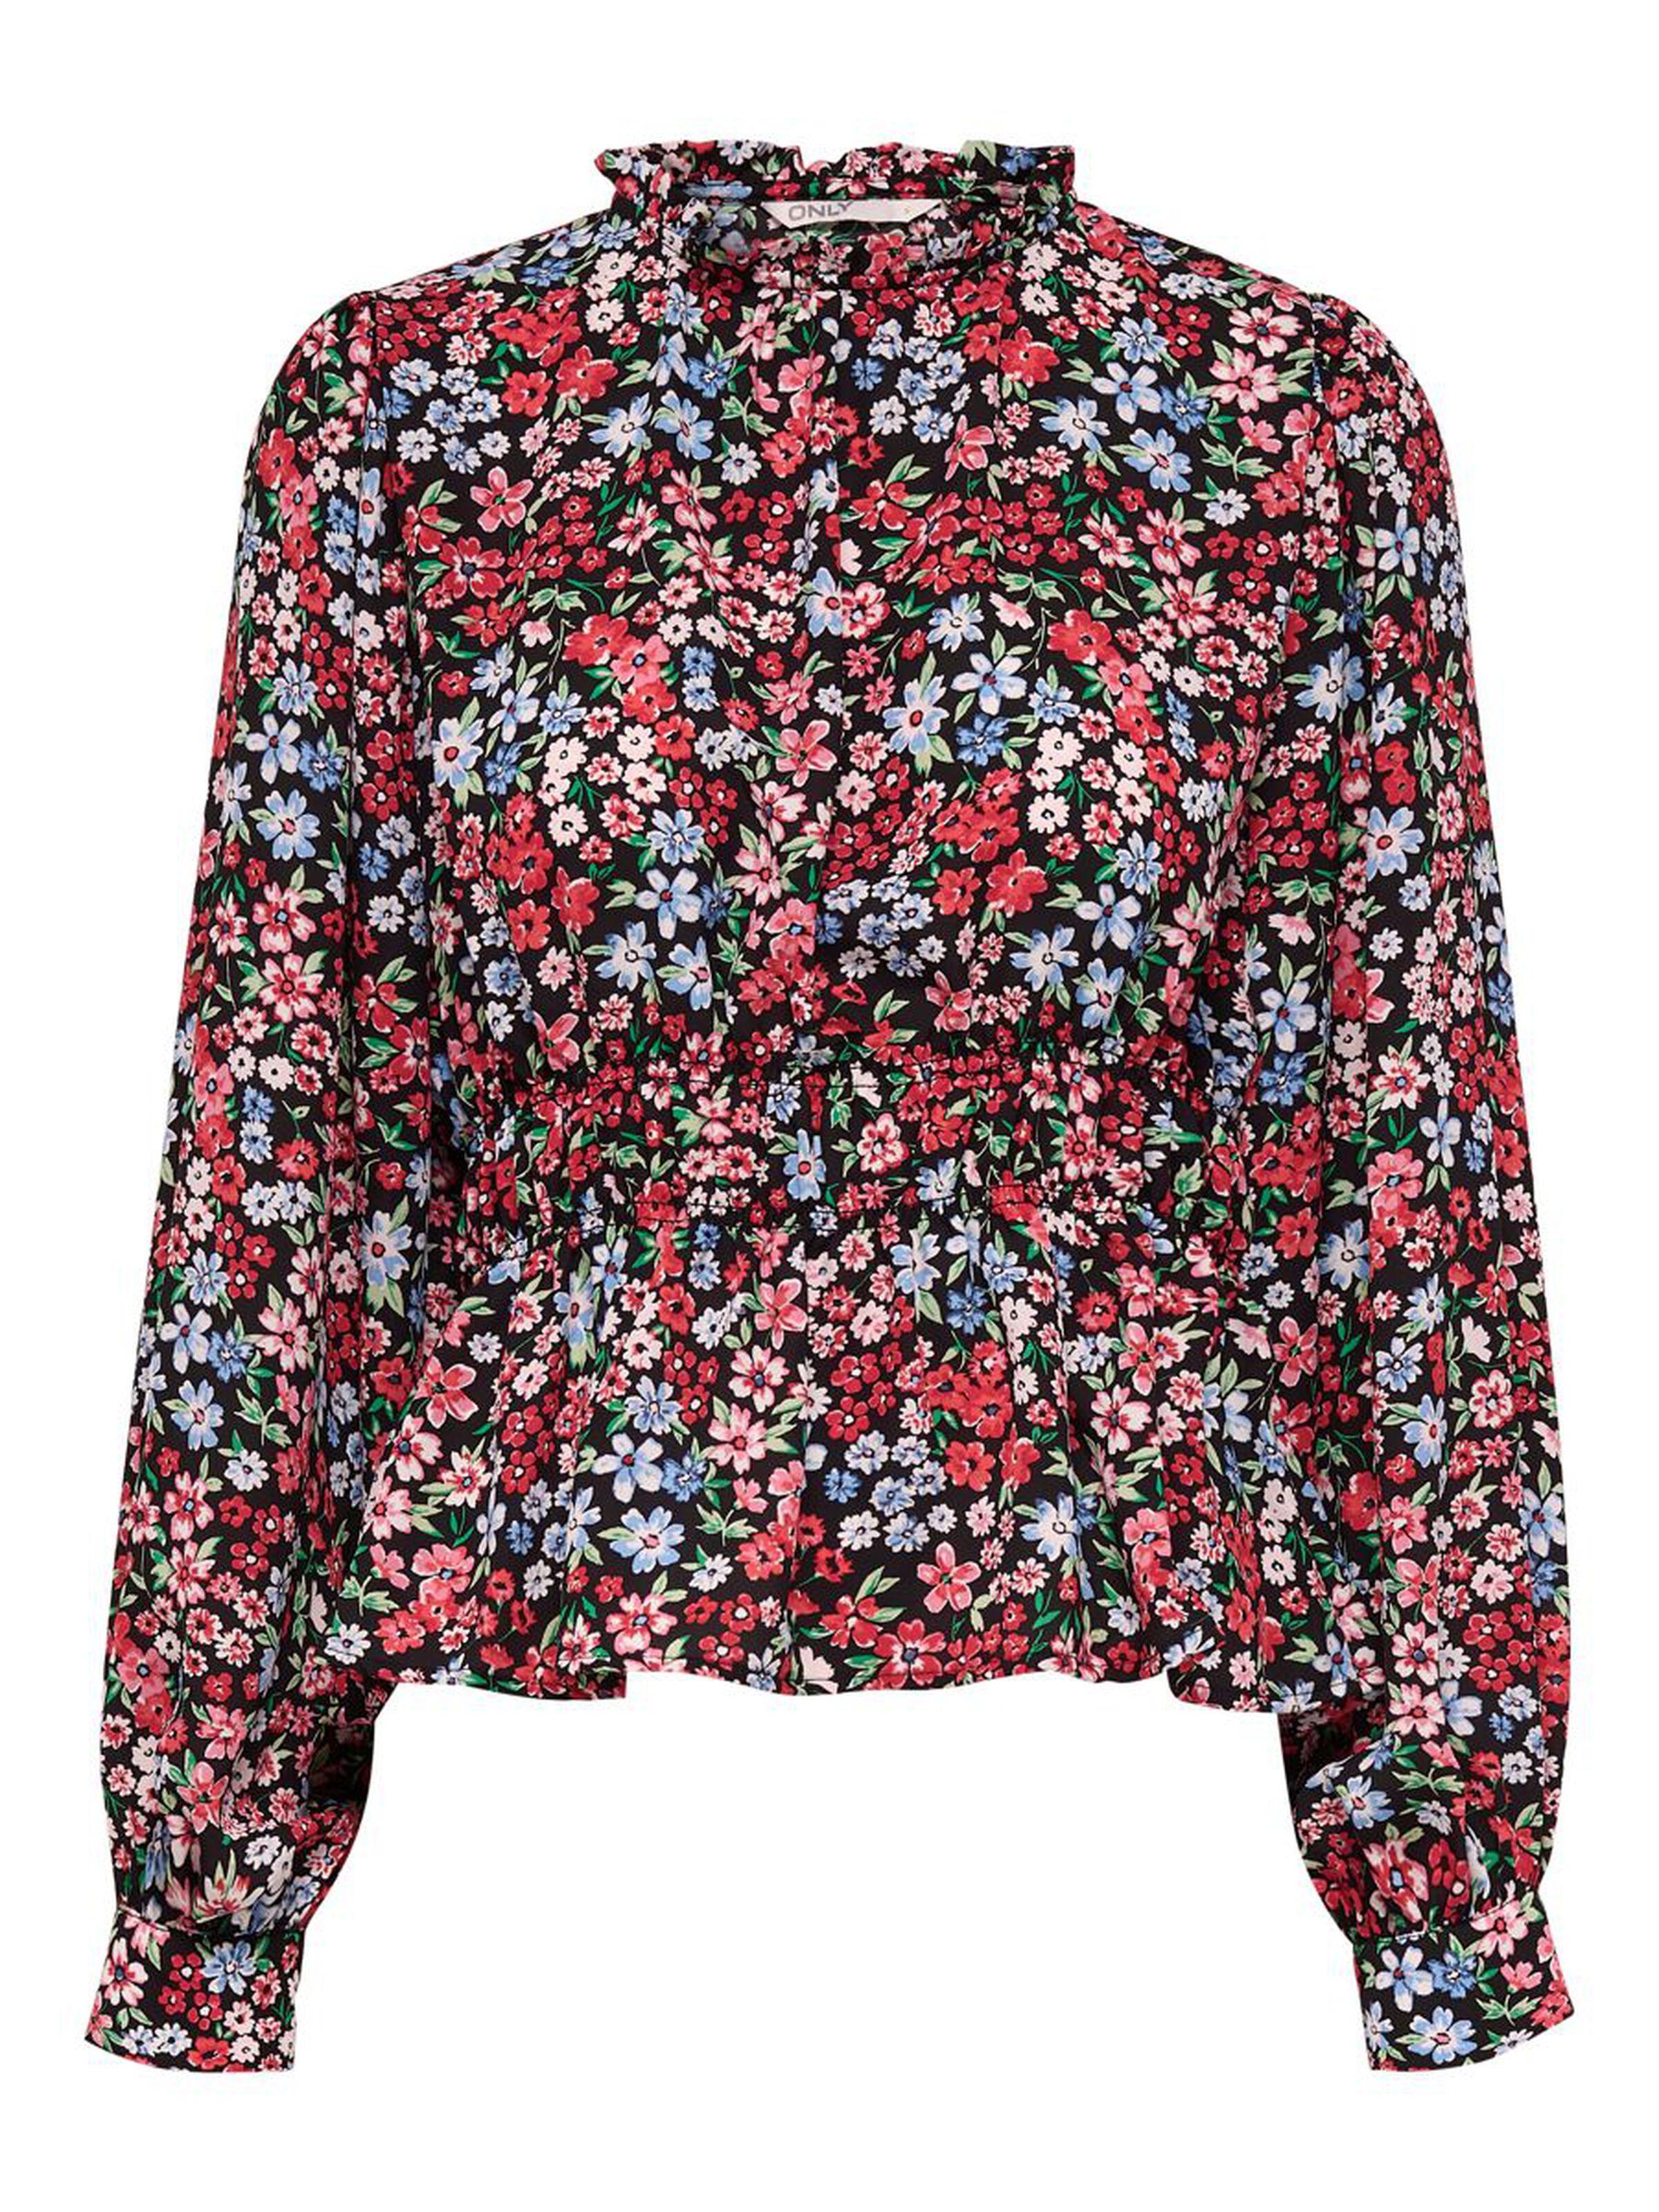 ONLY   Shirt   15221097BLACKSHOREFLOW